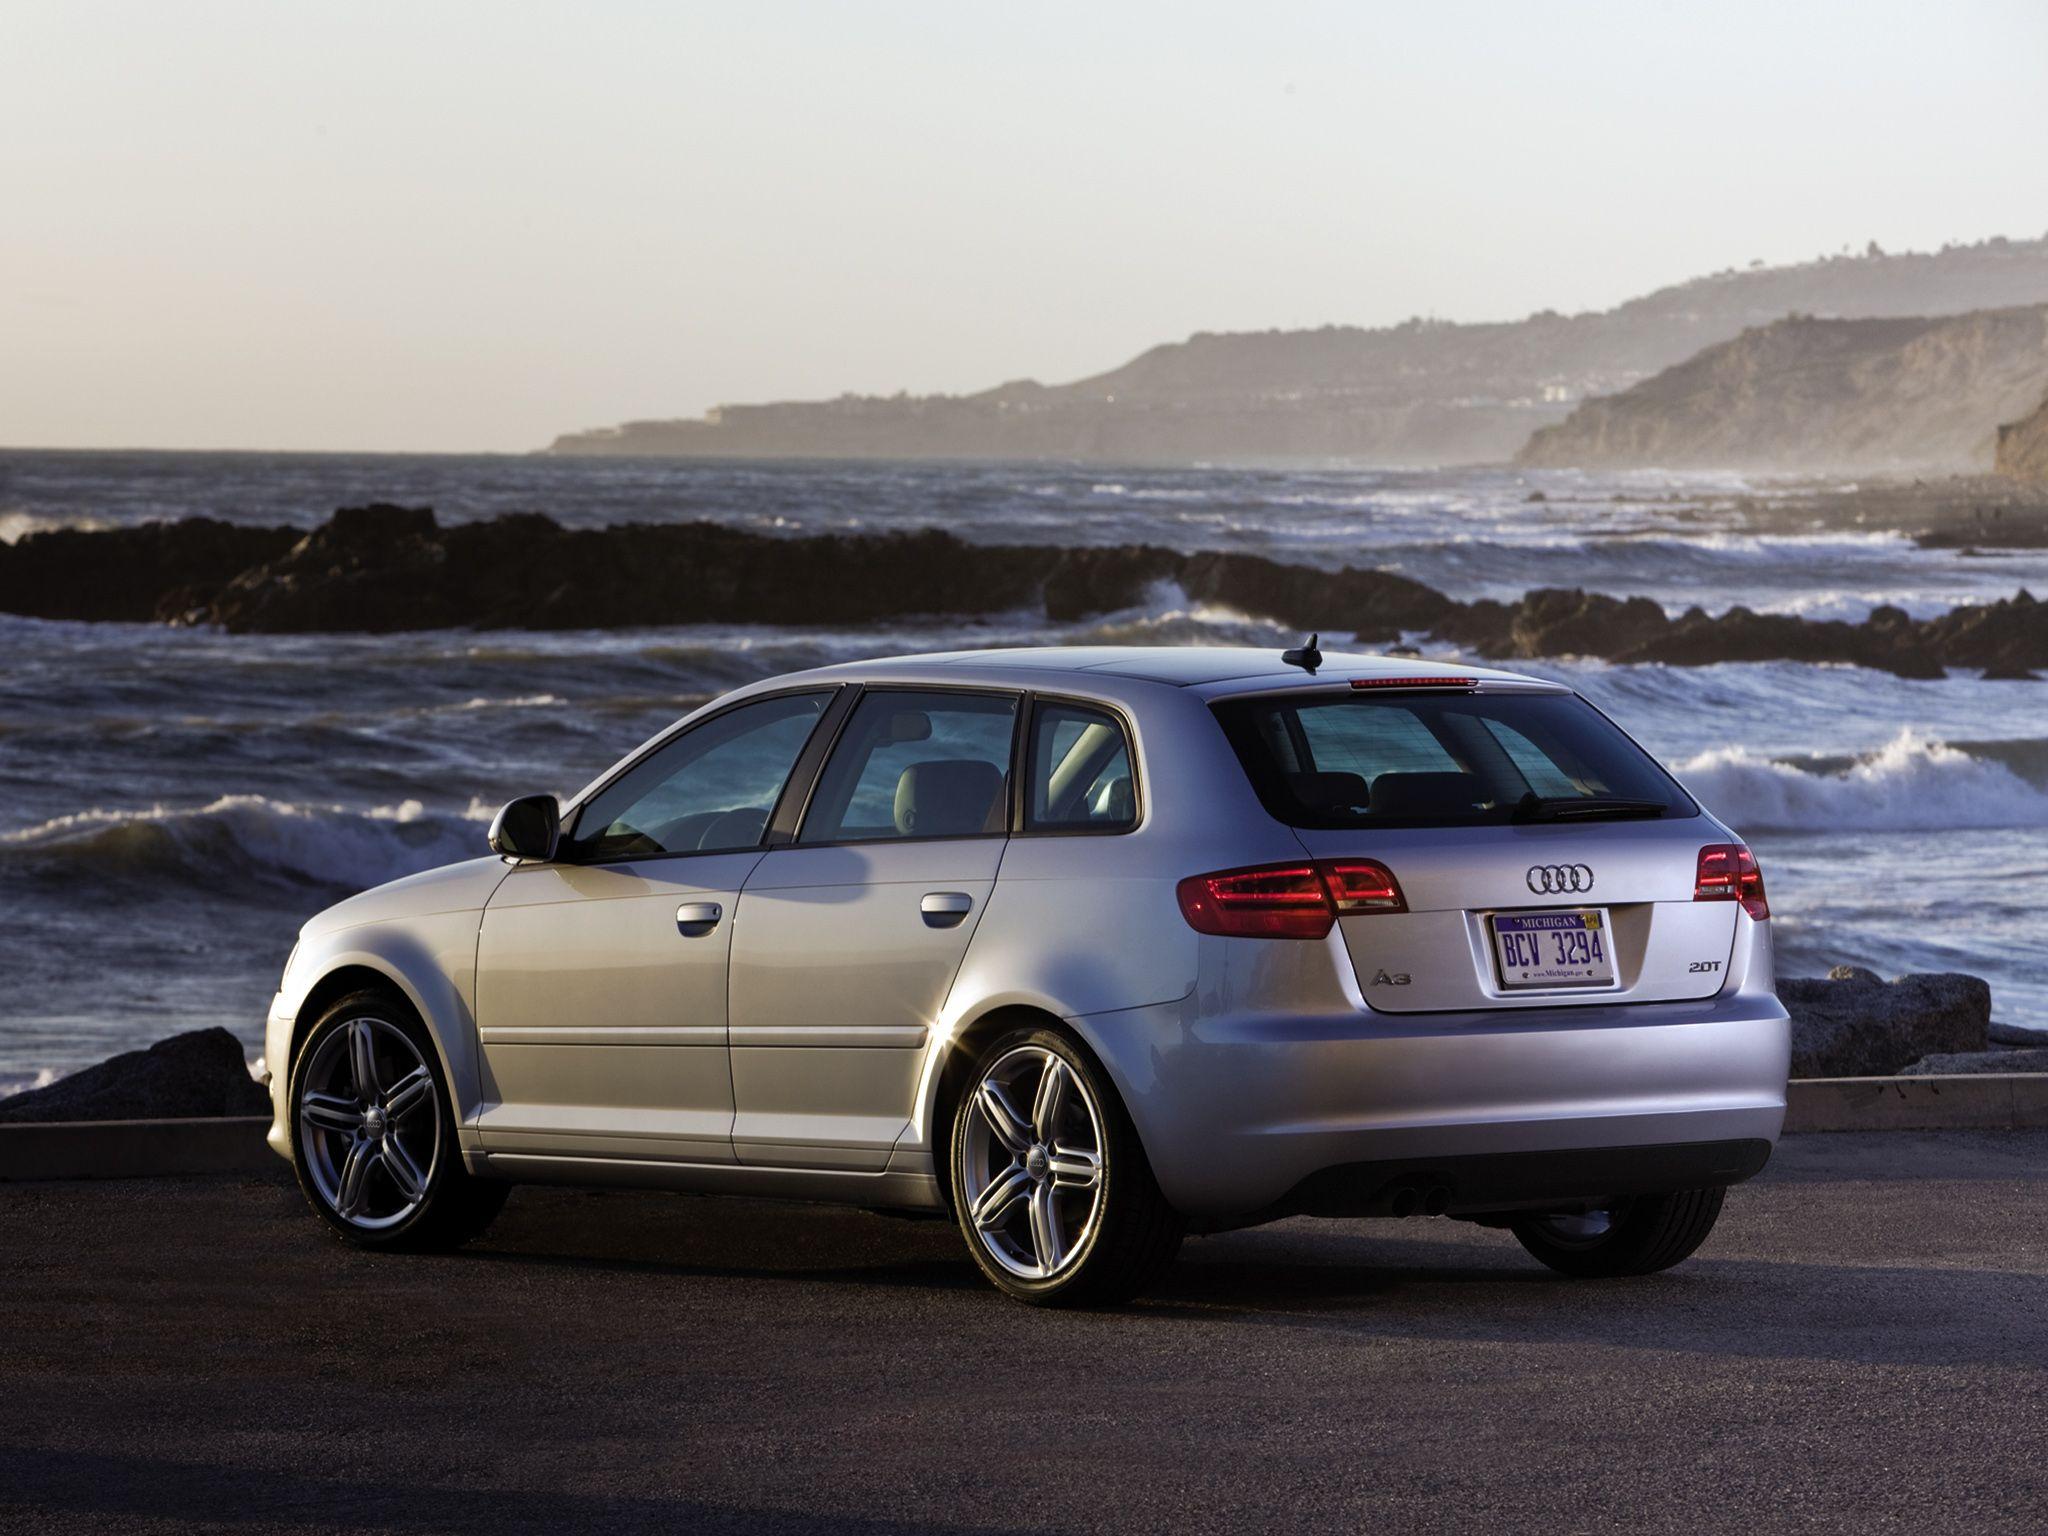 2010 Audi A3 Sportback Audi A3 Sportback 2 0t Us Spec Wallpapers